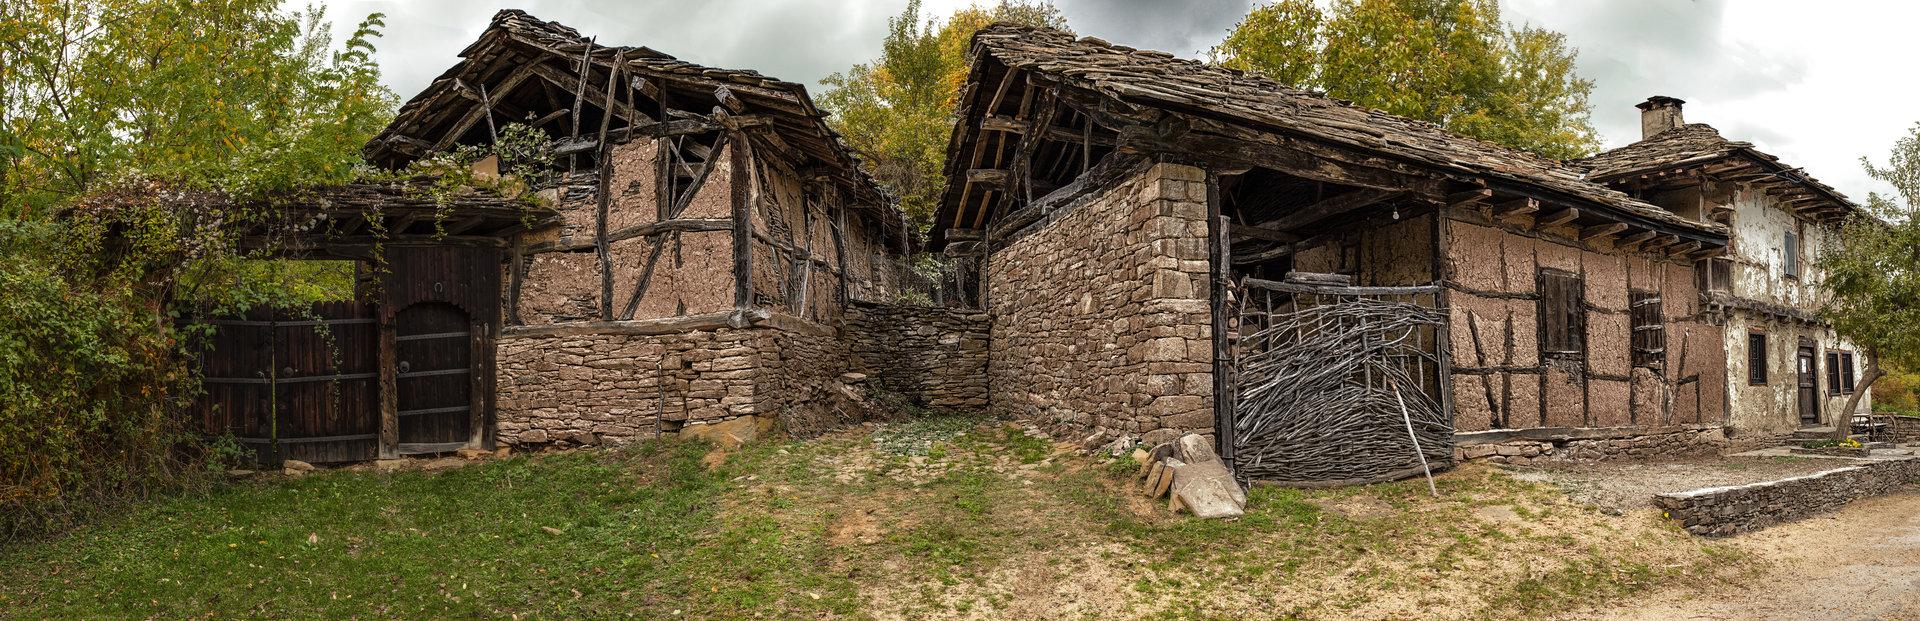 Архитектурен резерват Старо Стефаново | Author SWIX | PHOTO FORUM